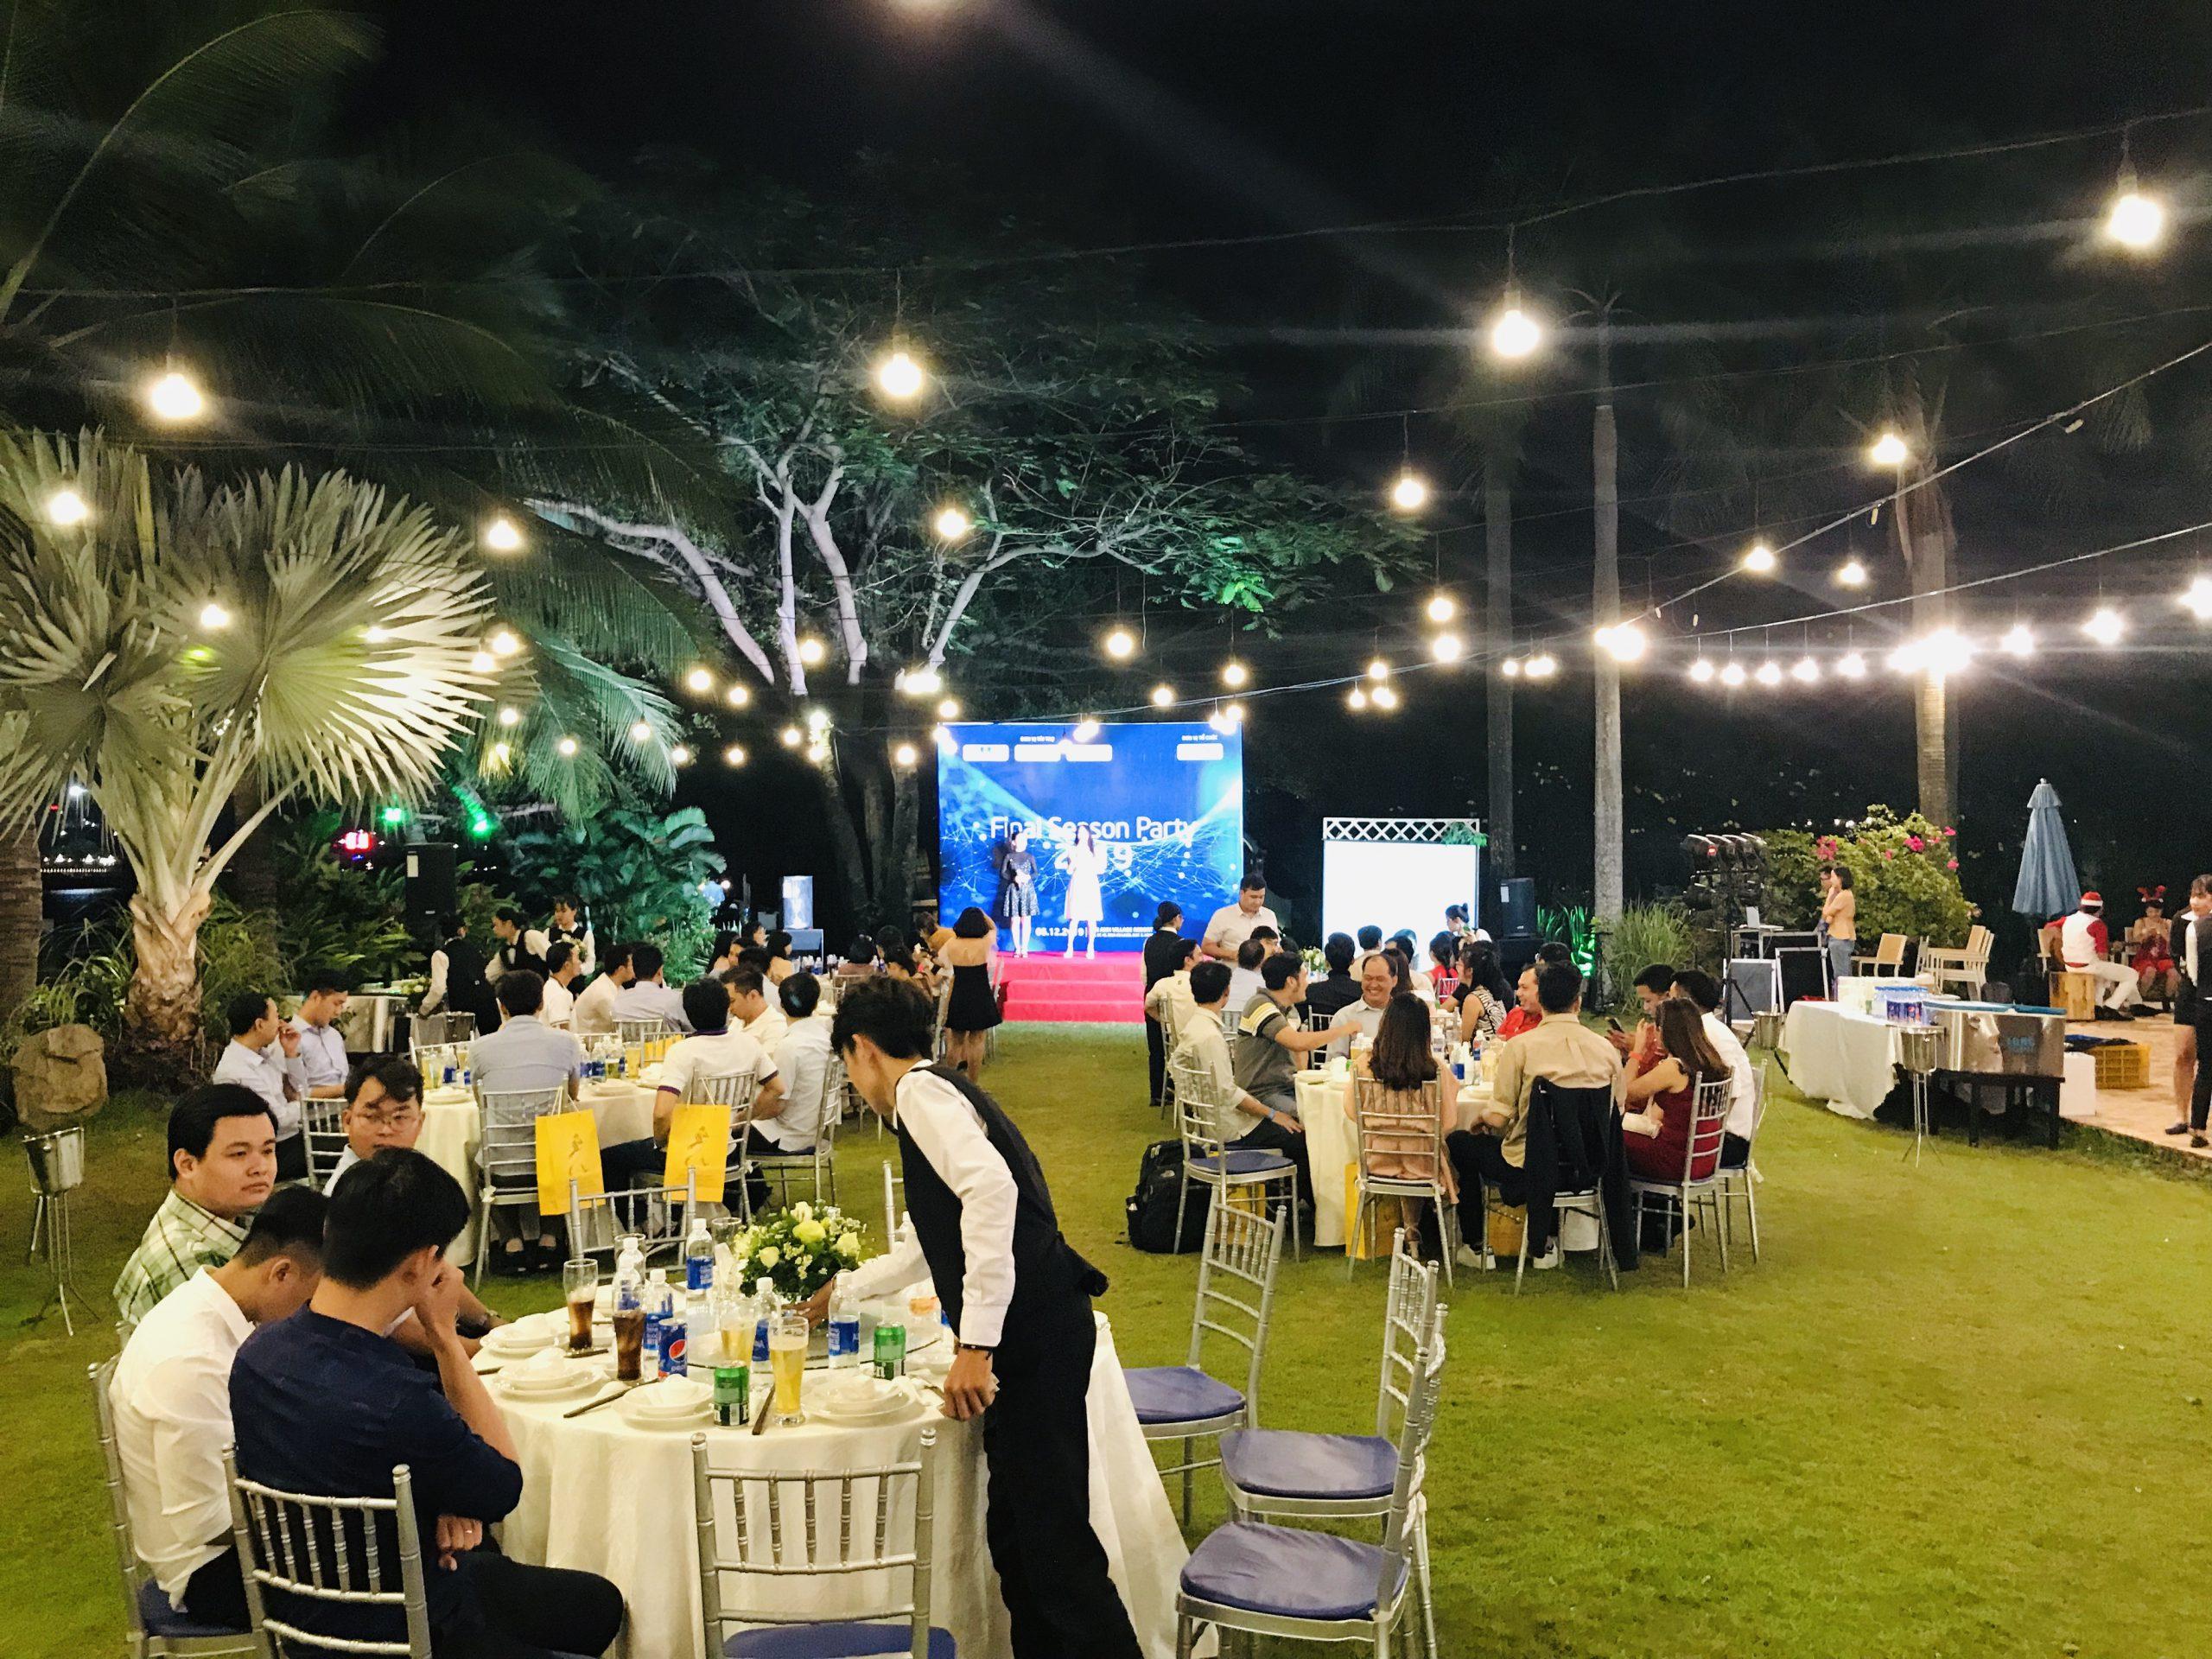 Final Seasons Party 2019